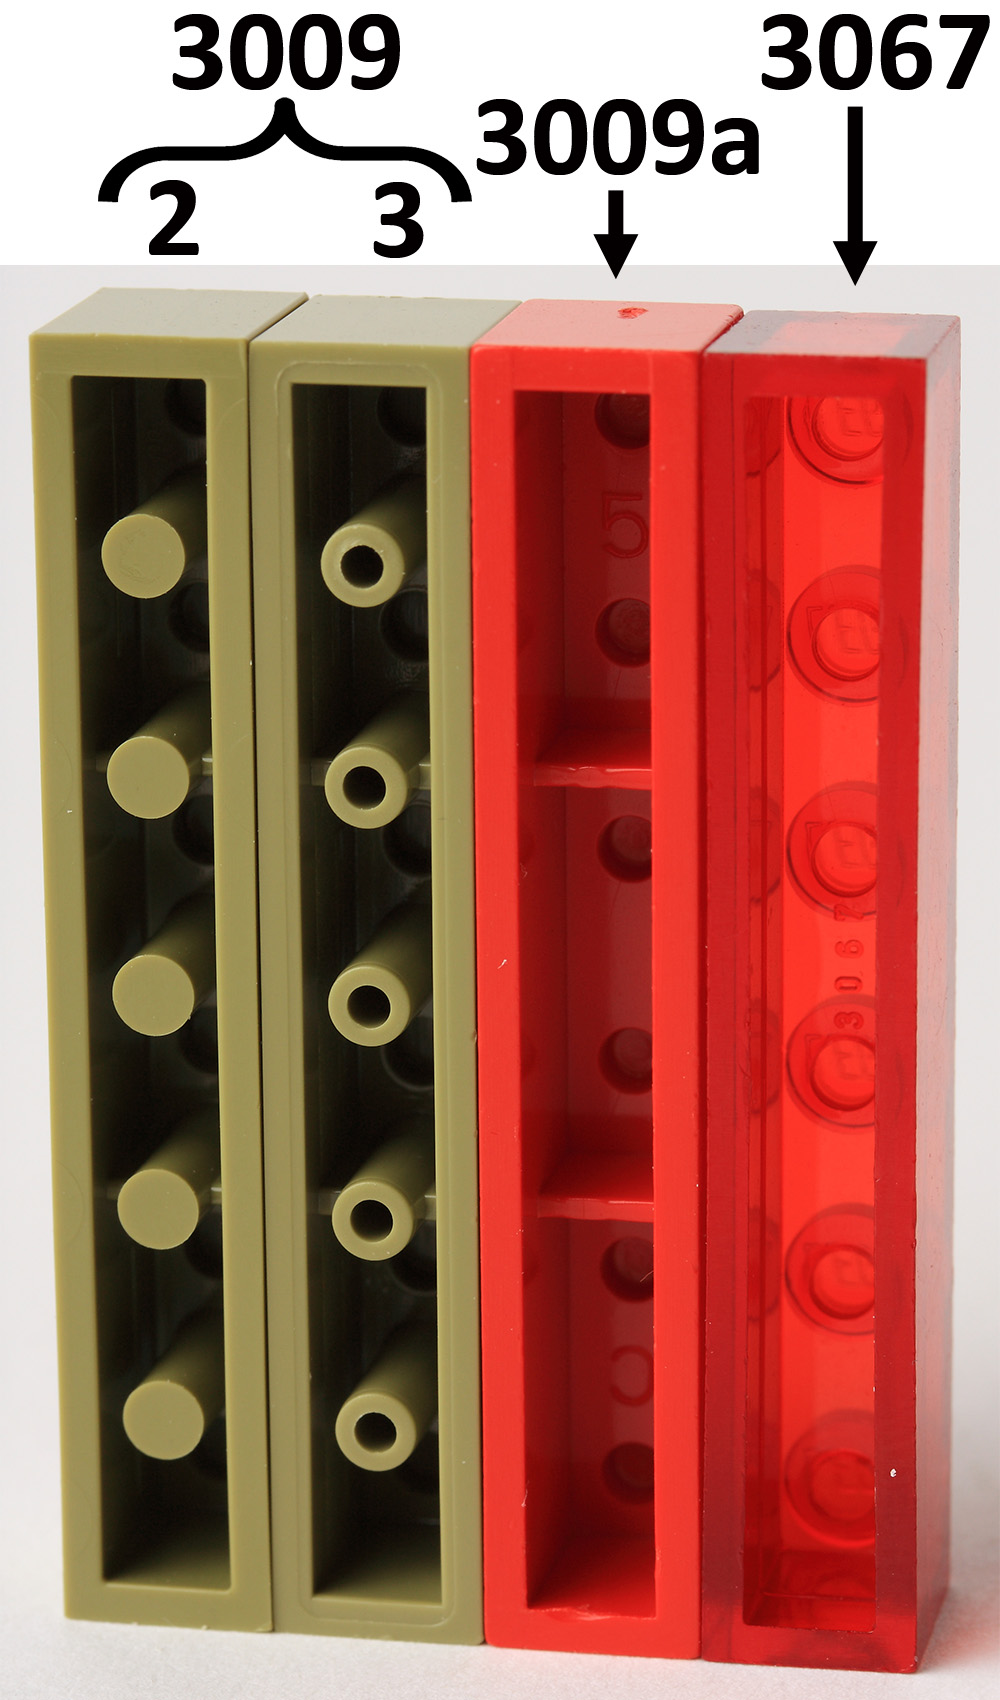 35 NEW LEGO Plate 1 x 6 Bricks reddish brown